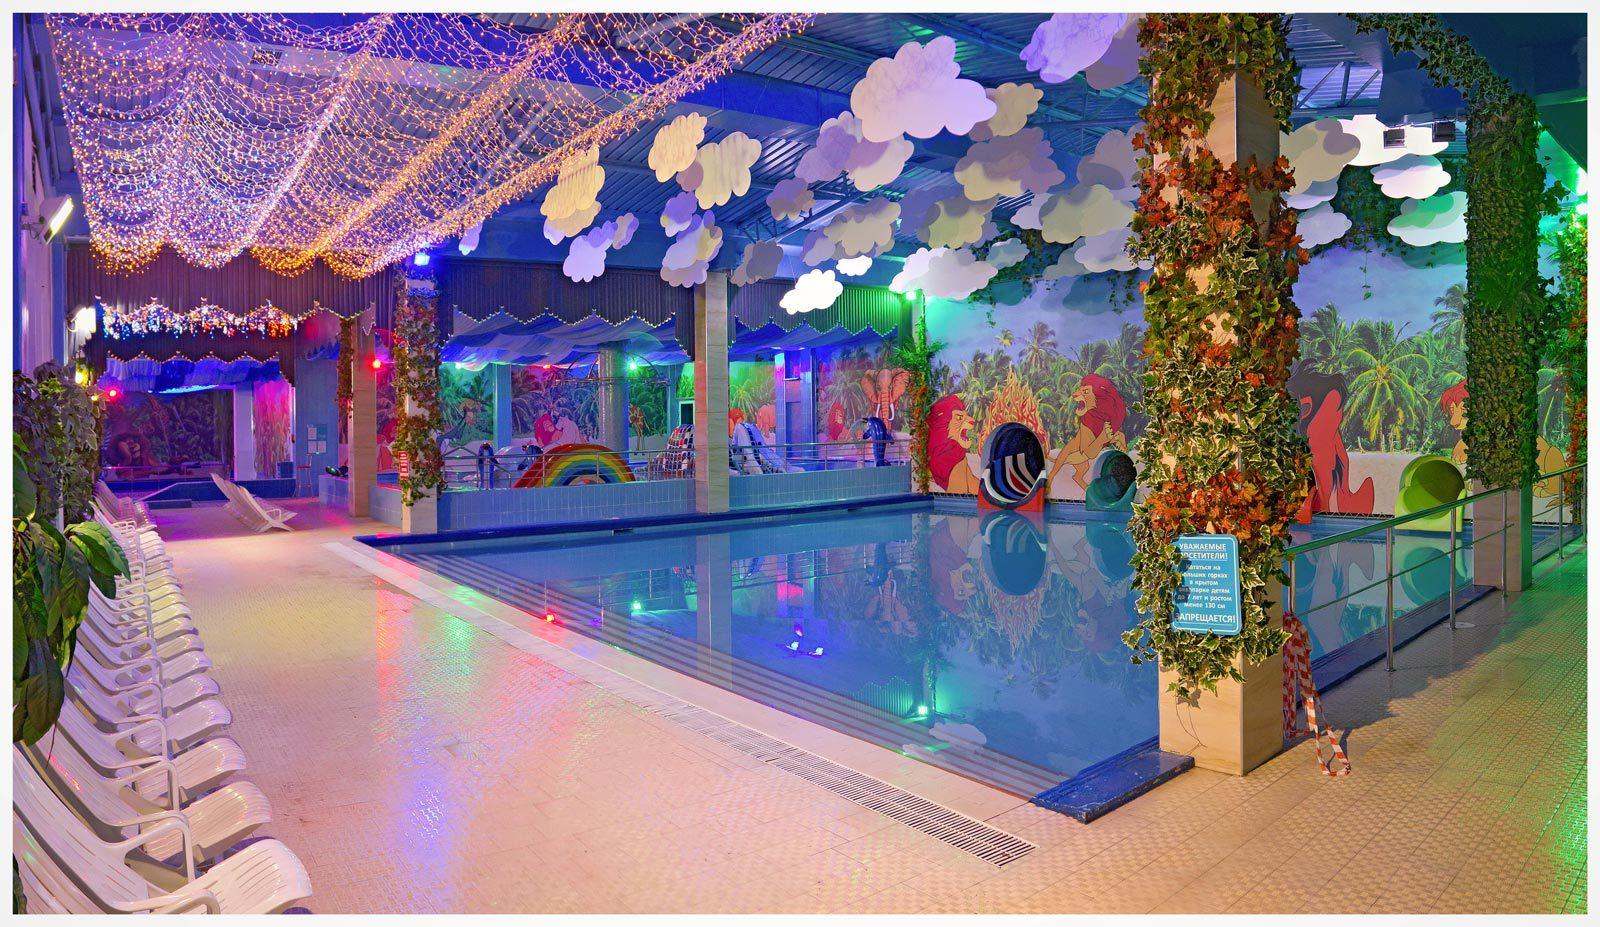 аквалоо крытый аквапарк фото